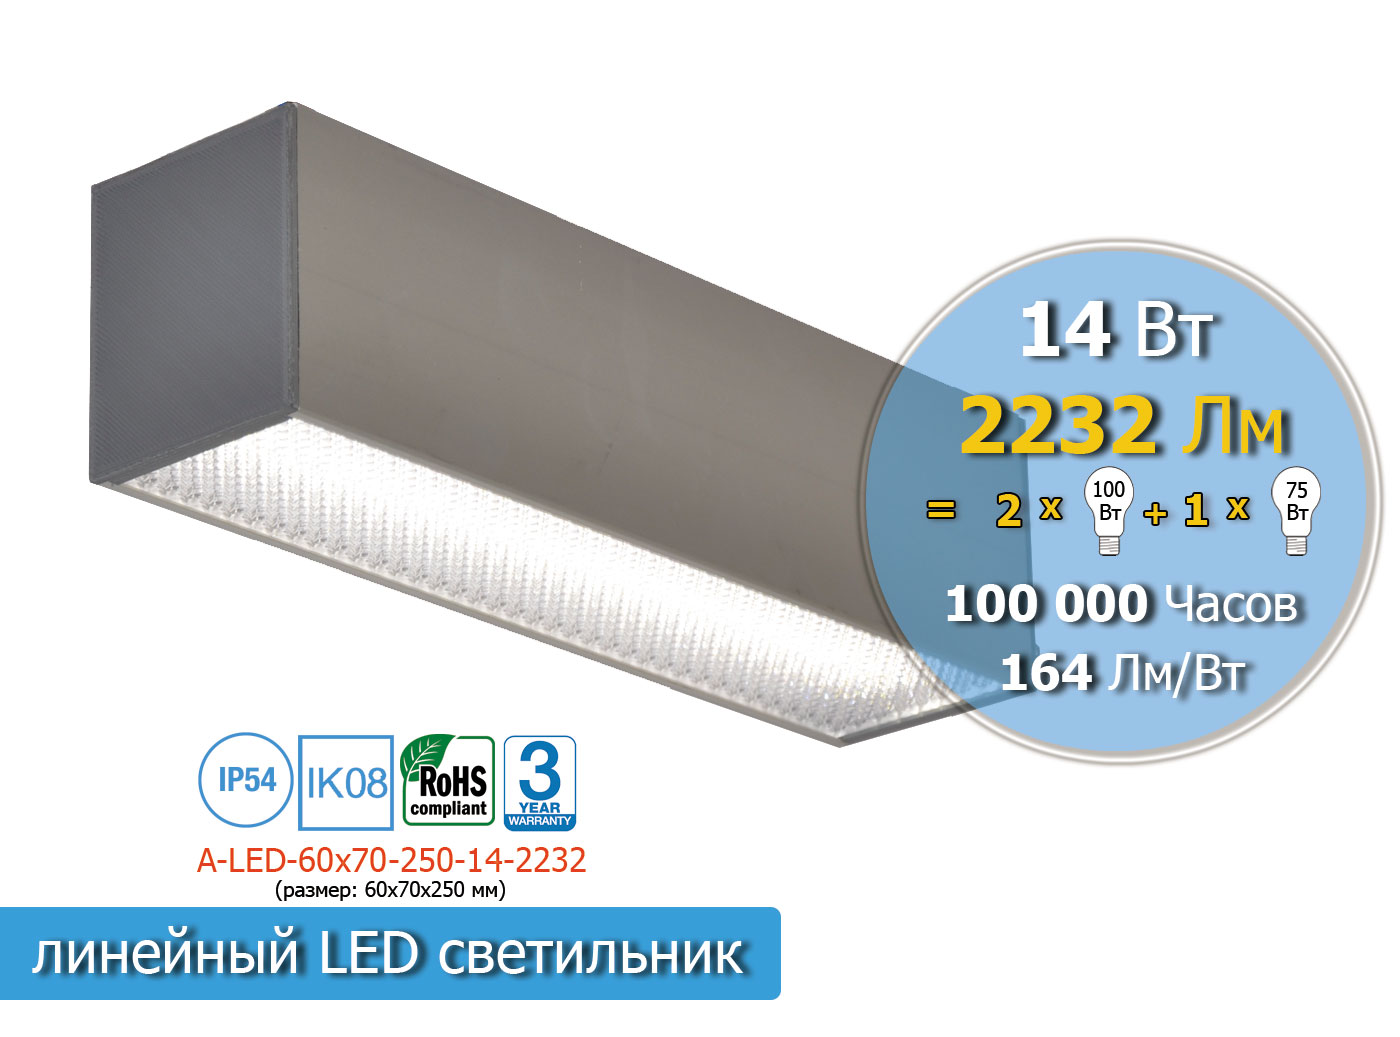 A-LED-60х70-250-14-2232